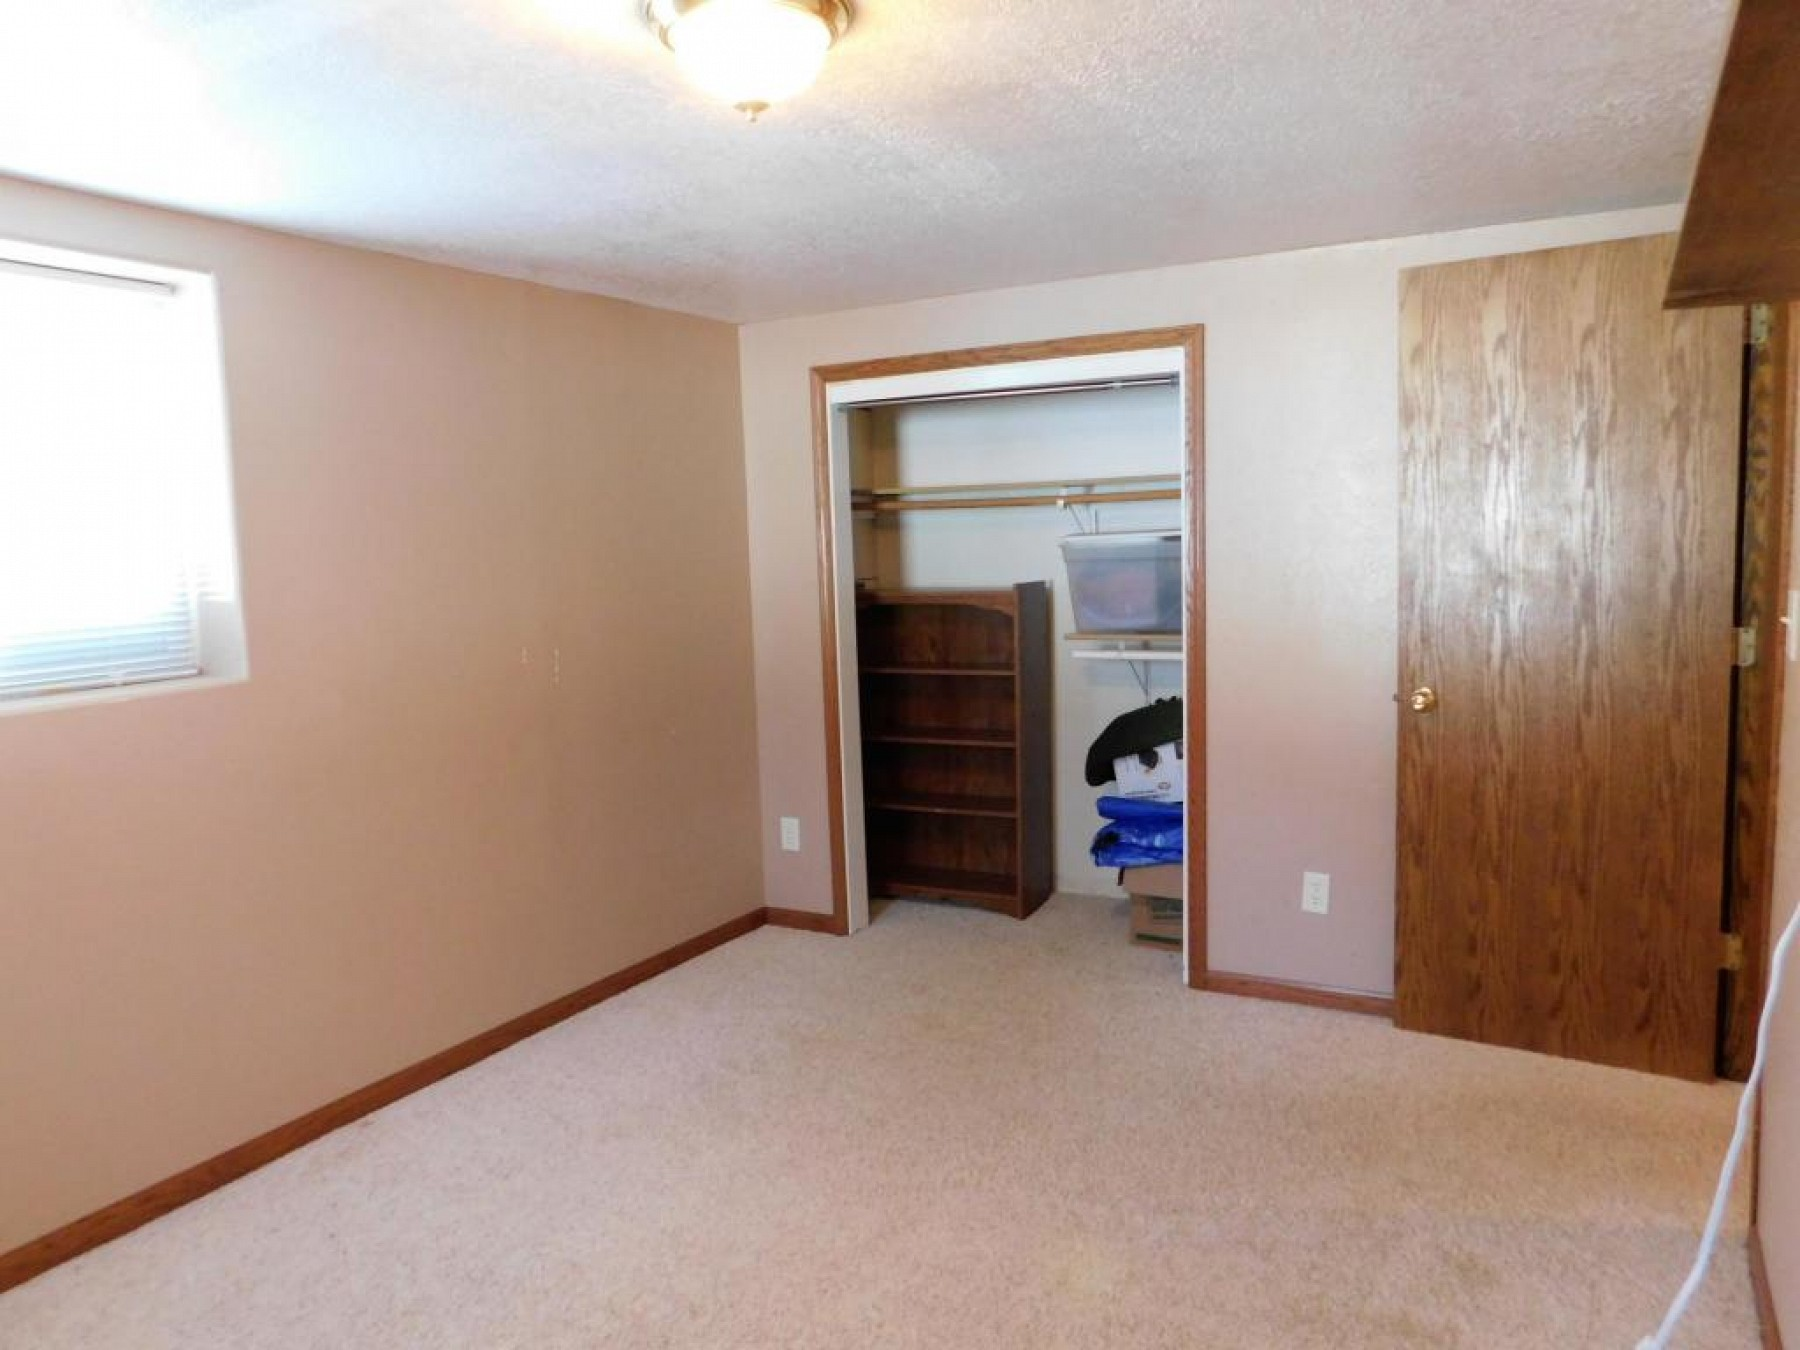 319 DakotaAvenue, Brookings, SD 57006